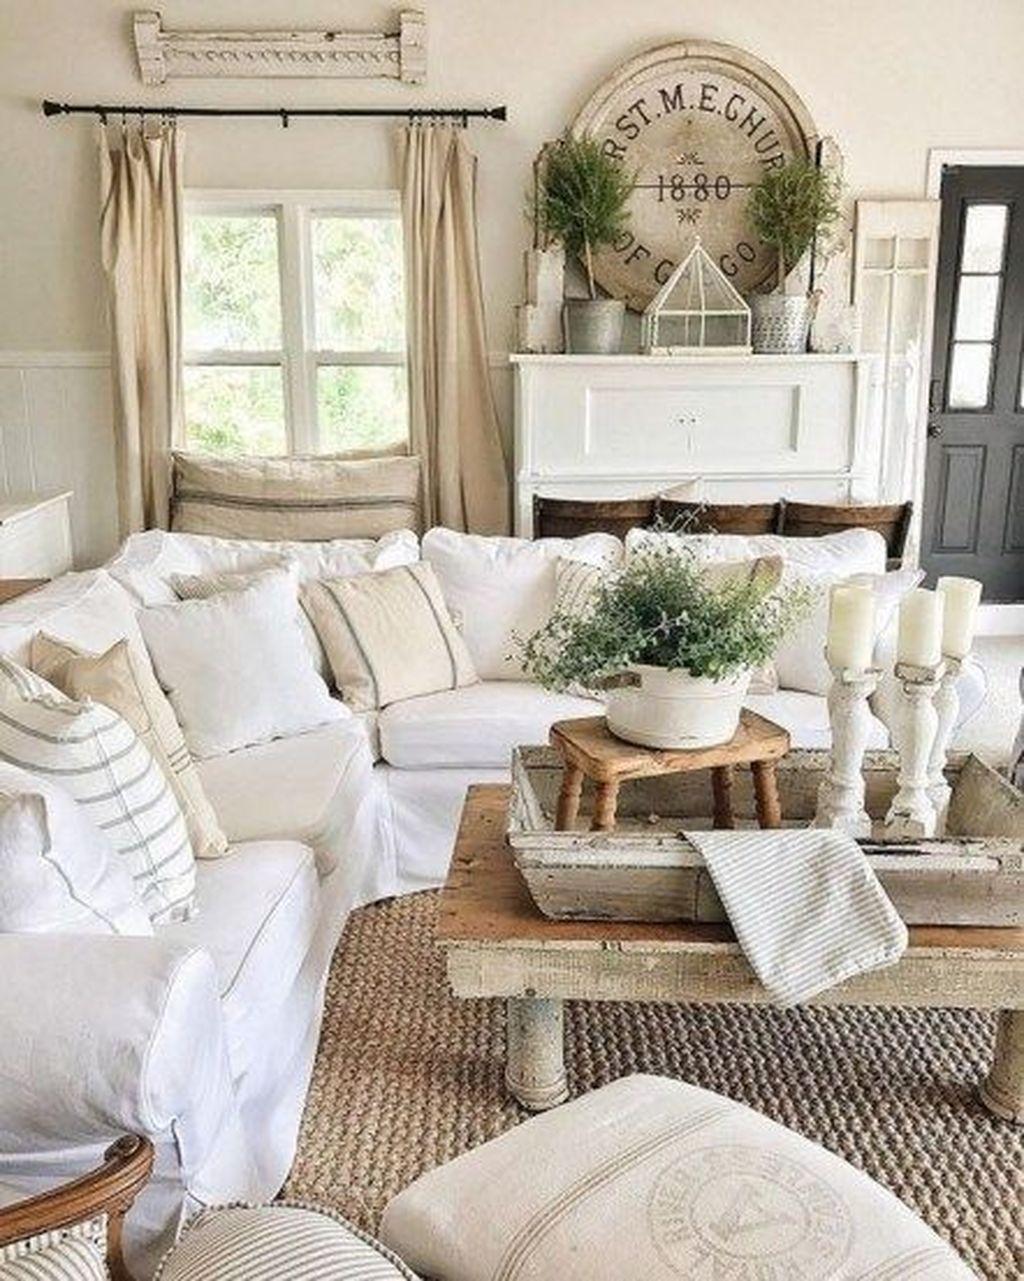 Incredible Rustic Farmhouse Living Room Design Ideas 35